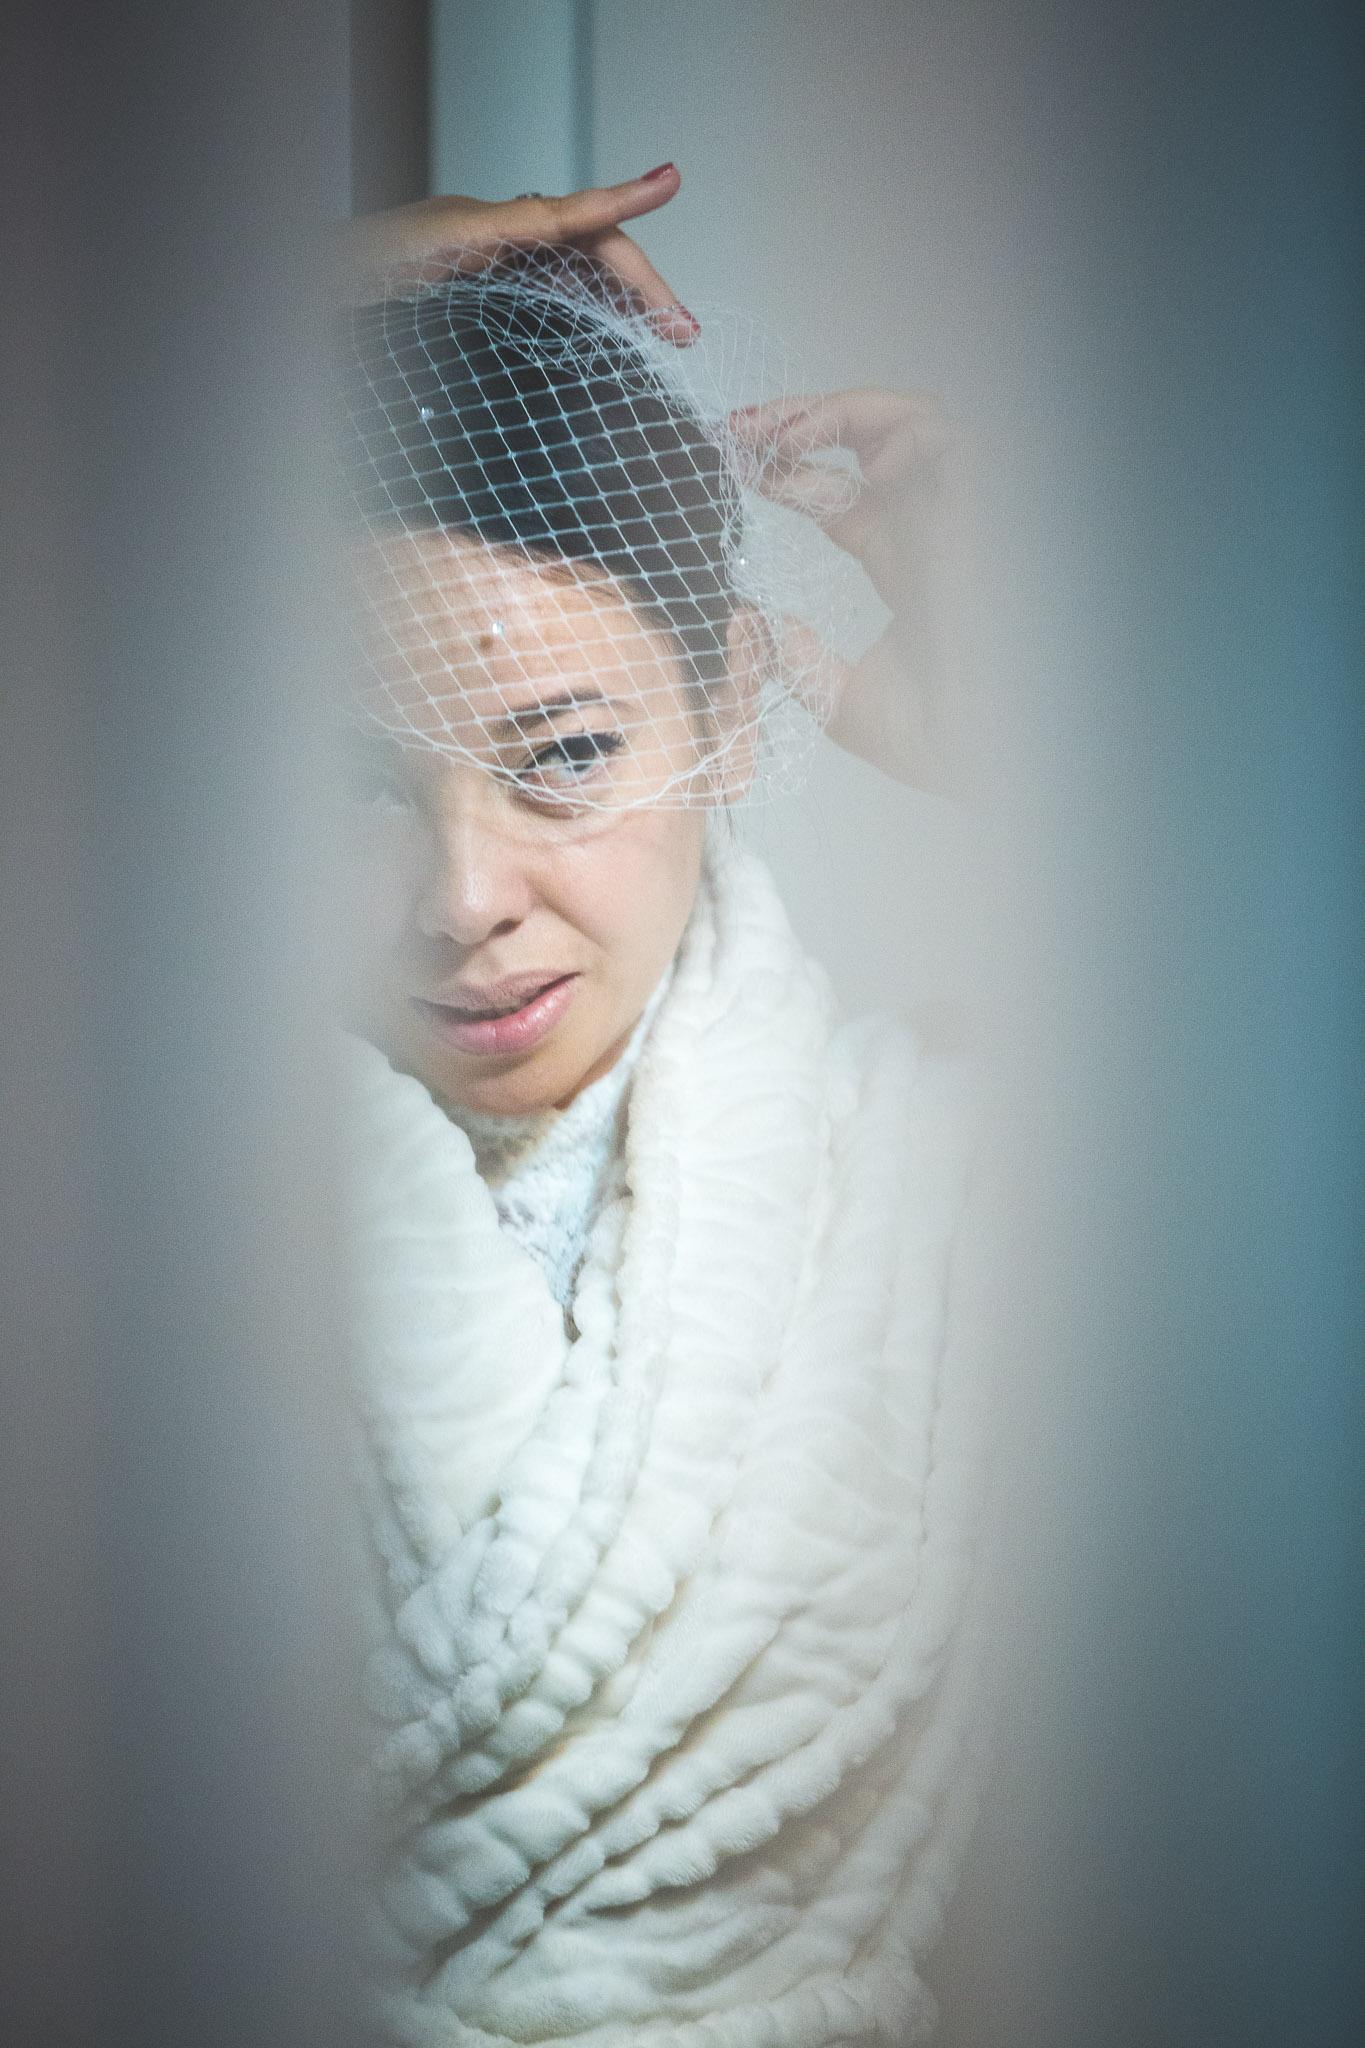 Geovanna-JP-wedding-shayne-gray-web-8544.jpg